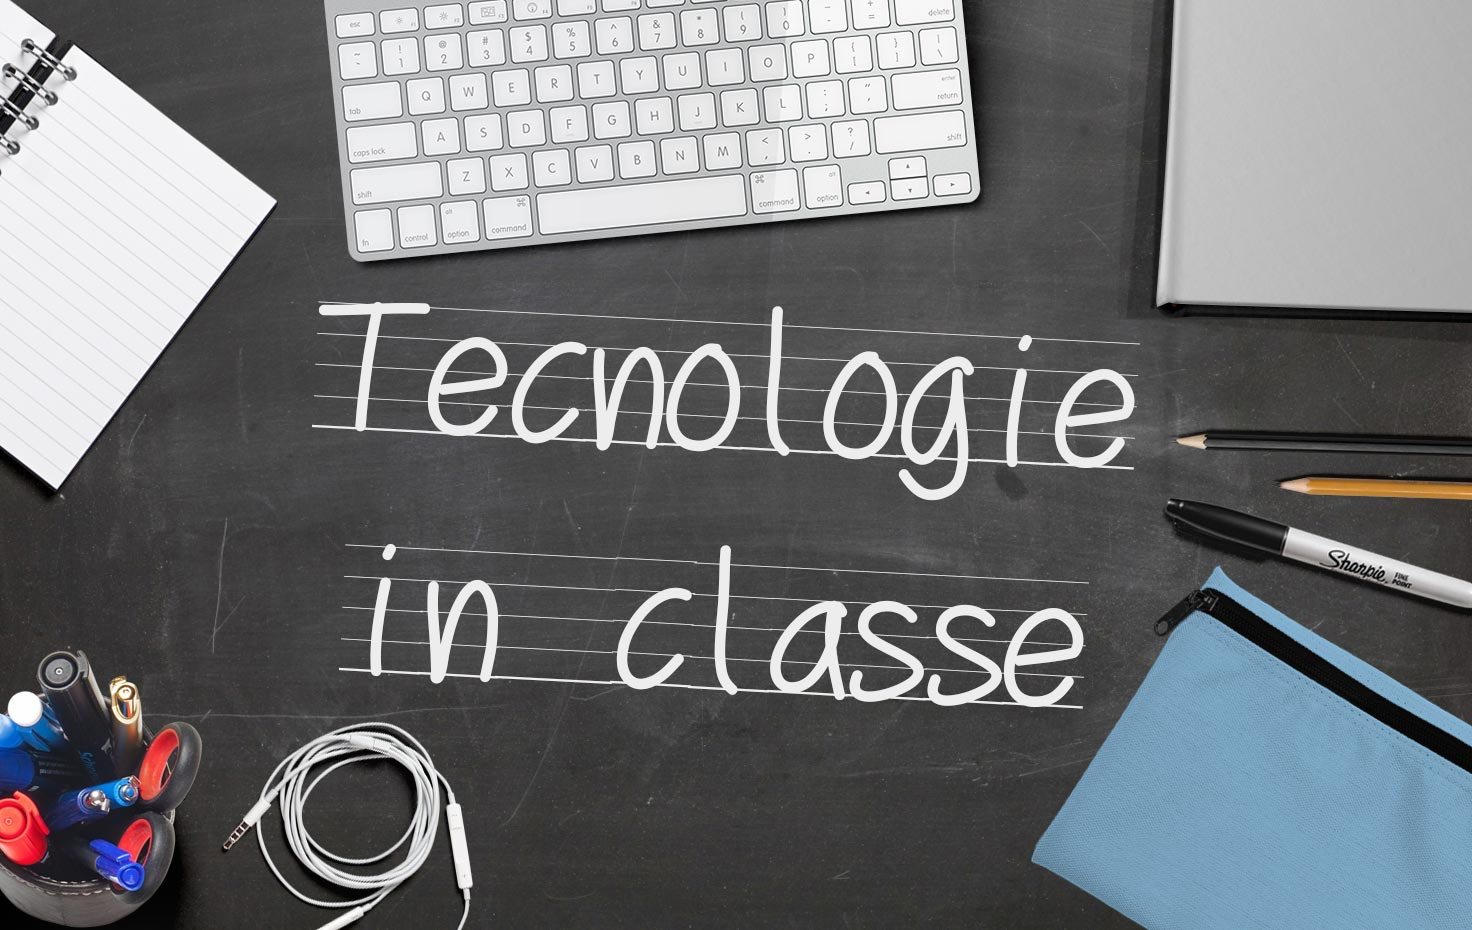 Tecnologie in classe